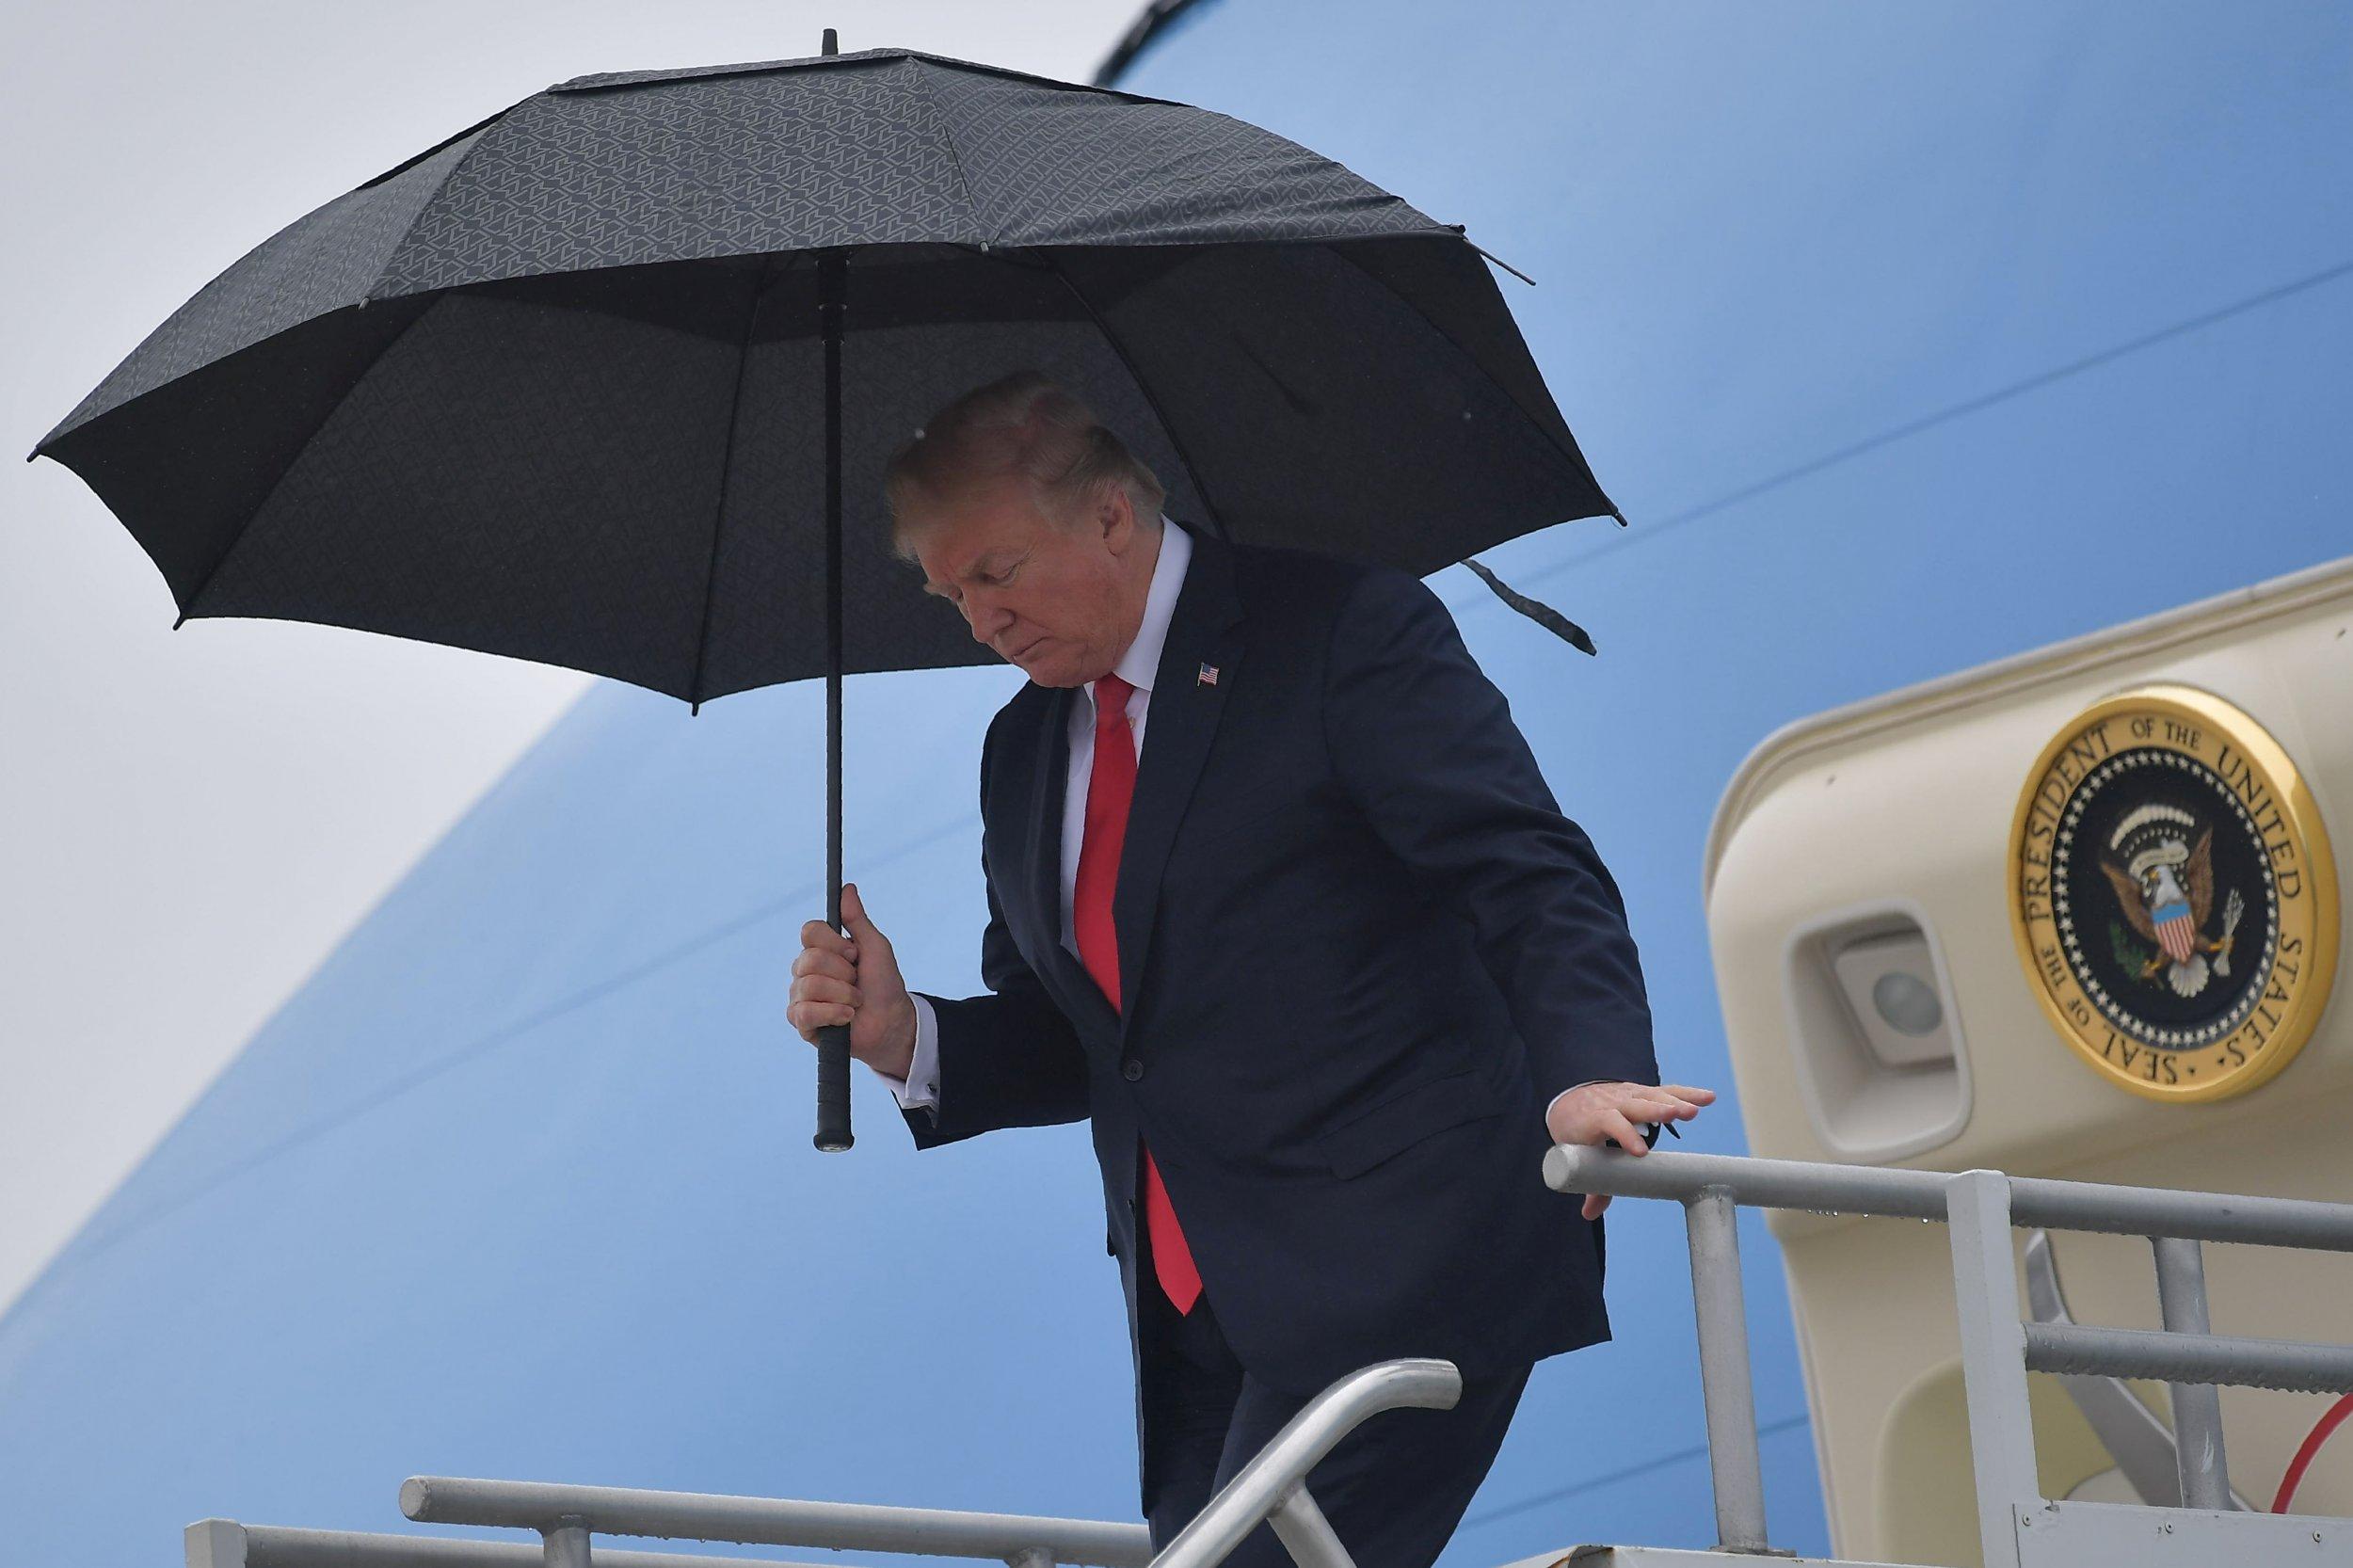 Donald Trump rain hair Amy Klobuchar Ana Navarro